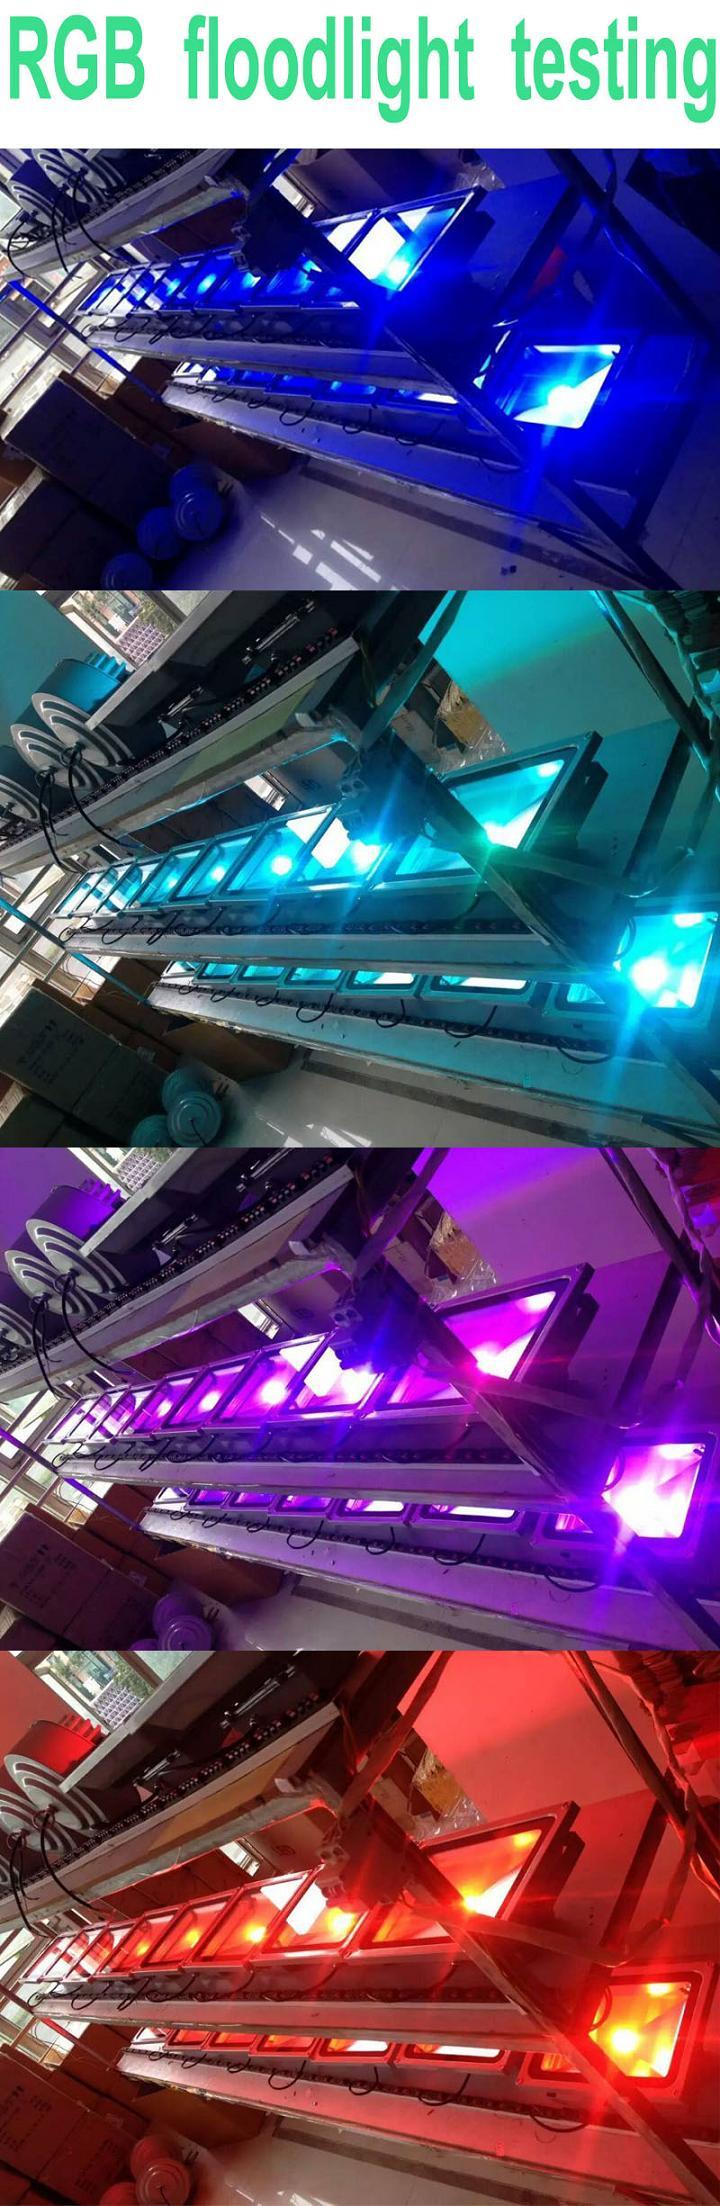 RGB Floodlight project